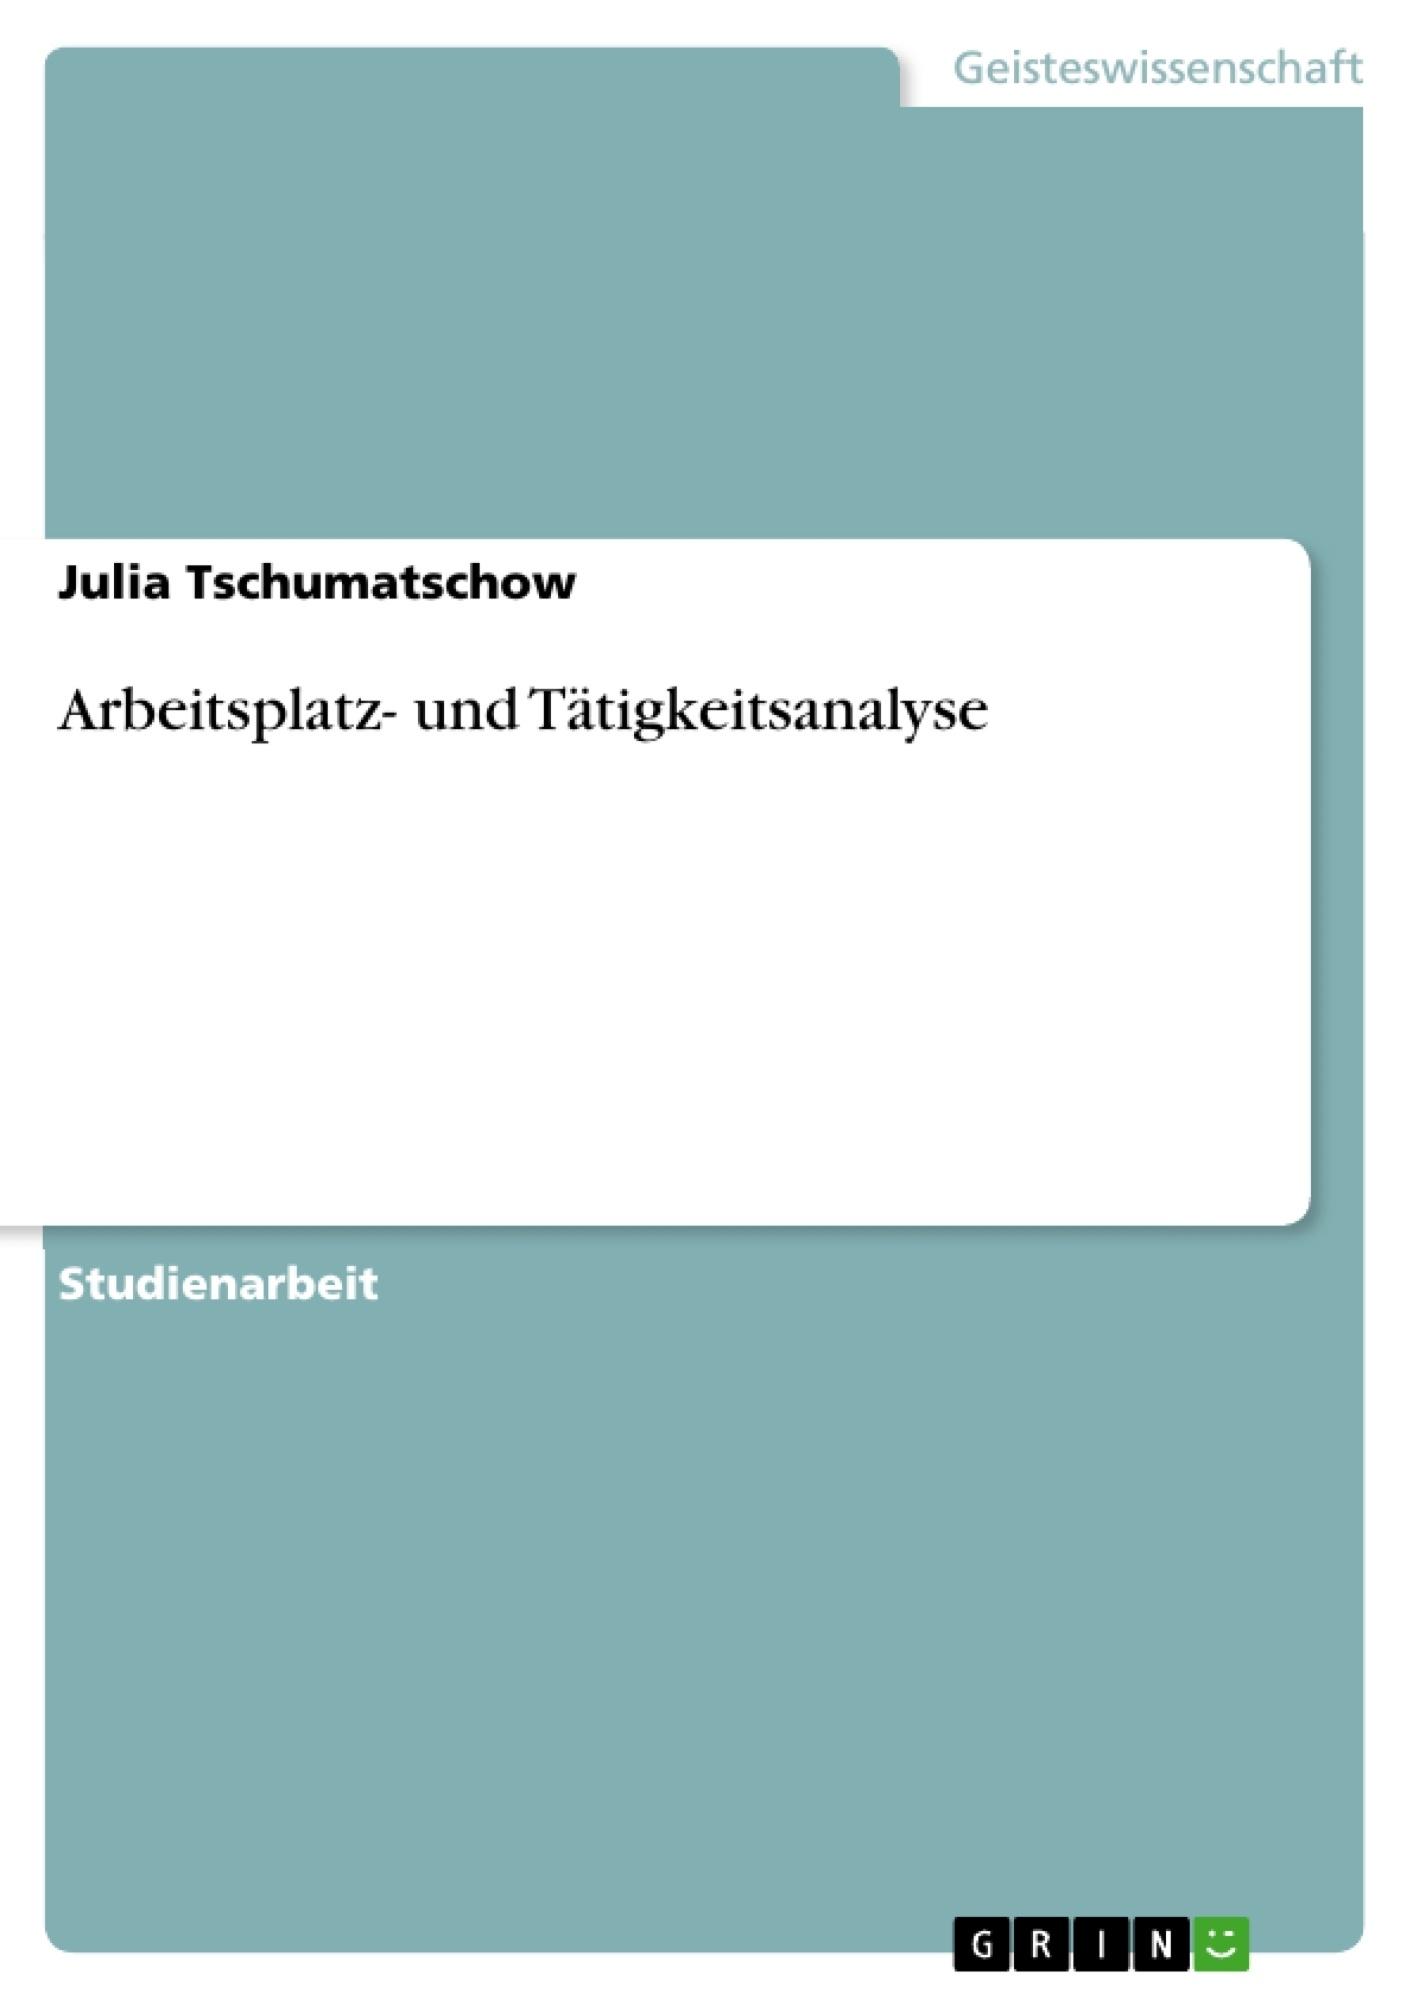 Titel: Arbeitsplatz- und Tätigkeitsanalyse